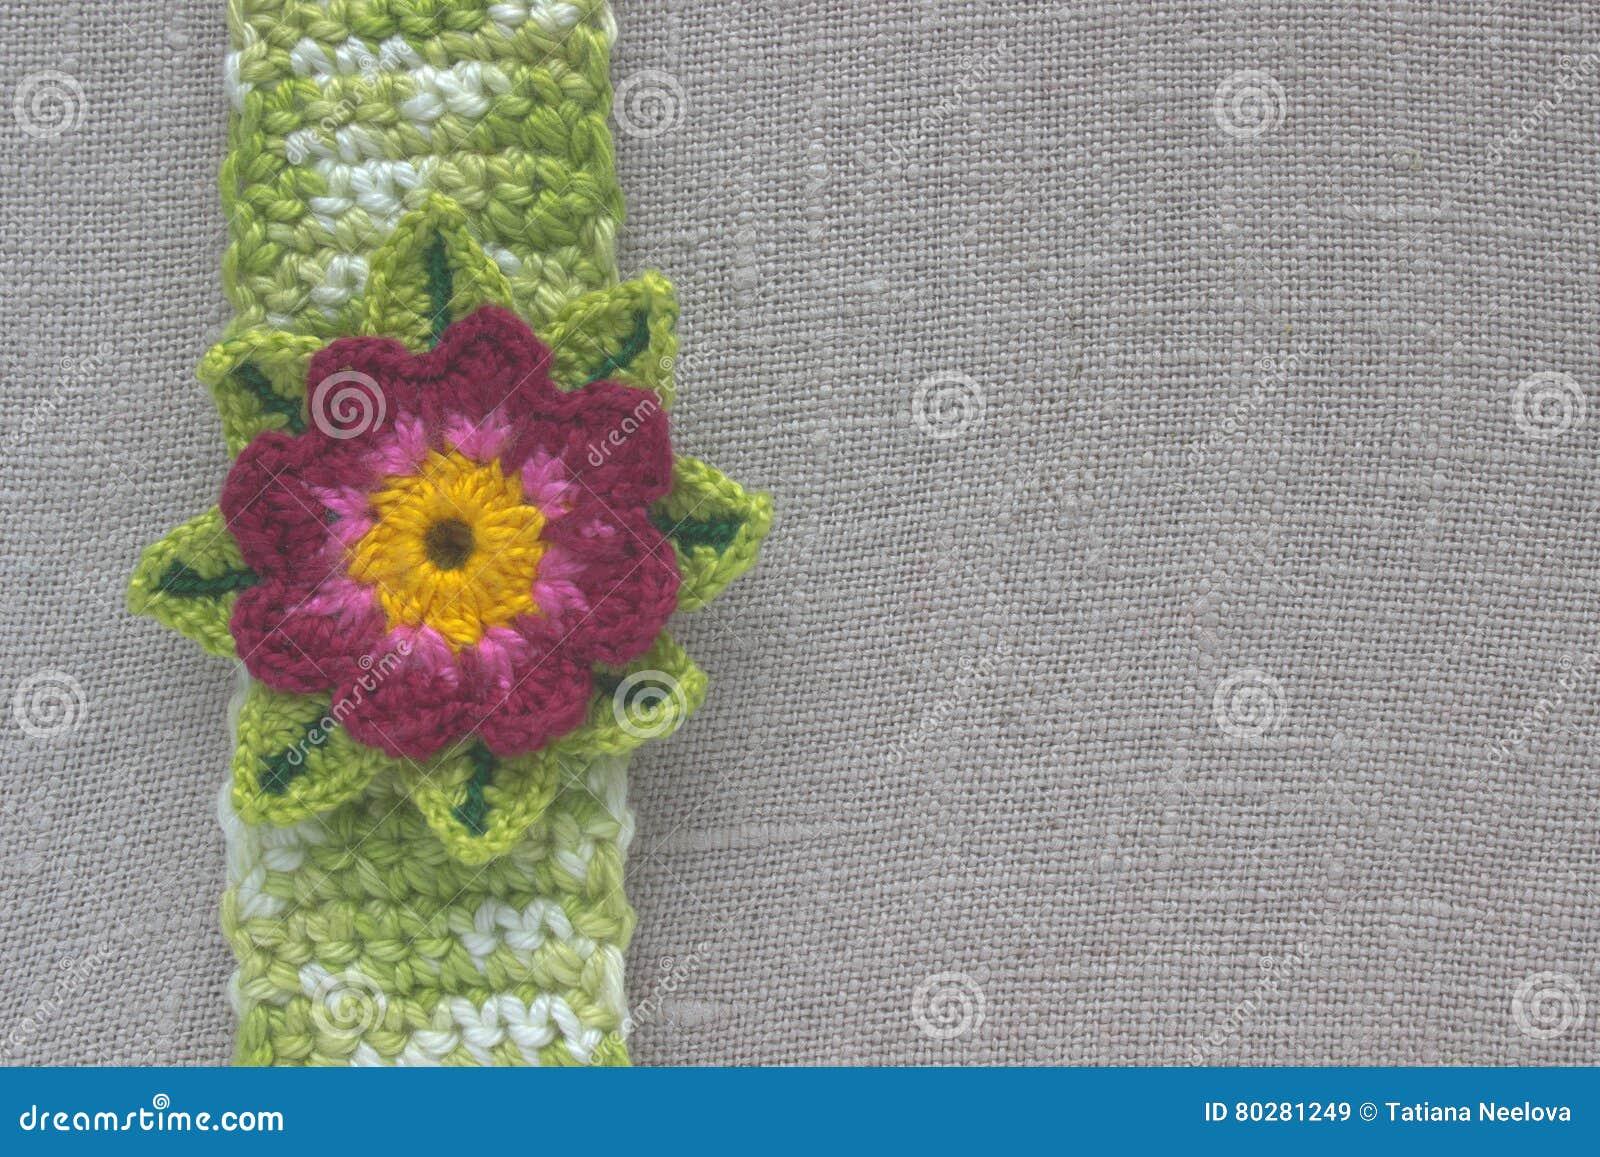 Crochet Lotus Flower On The Natural Ecological Linen Cloth Vintage